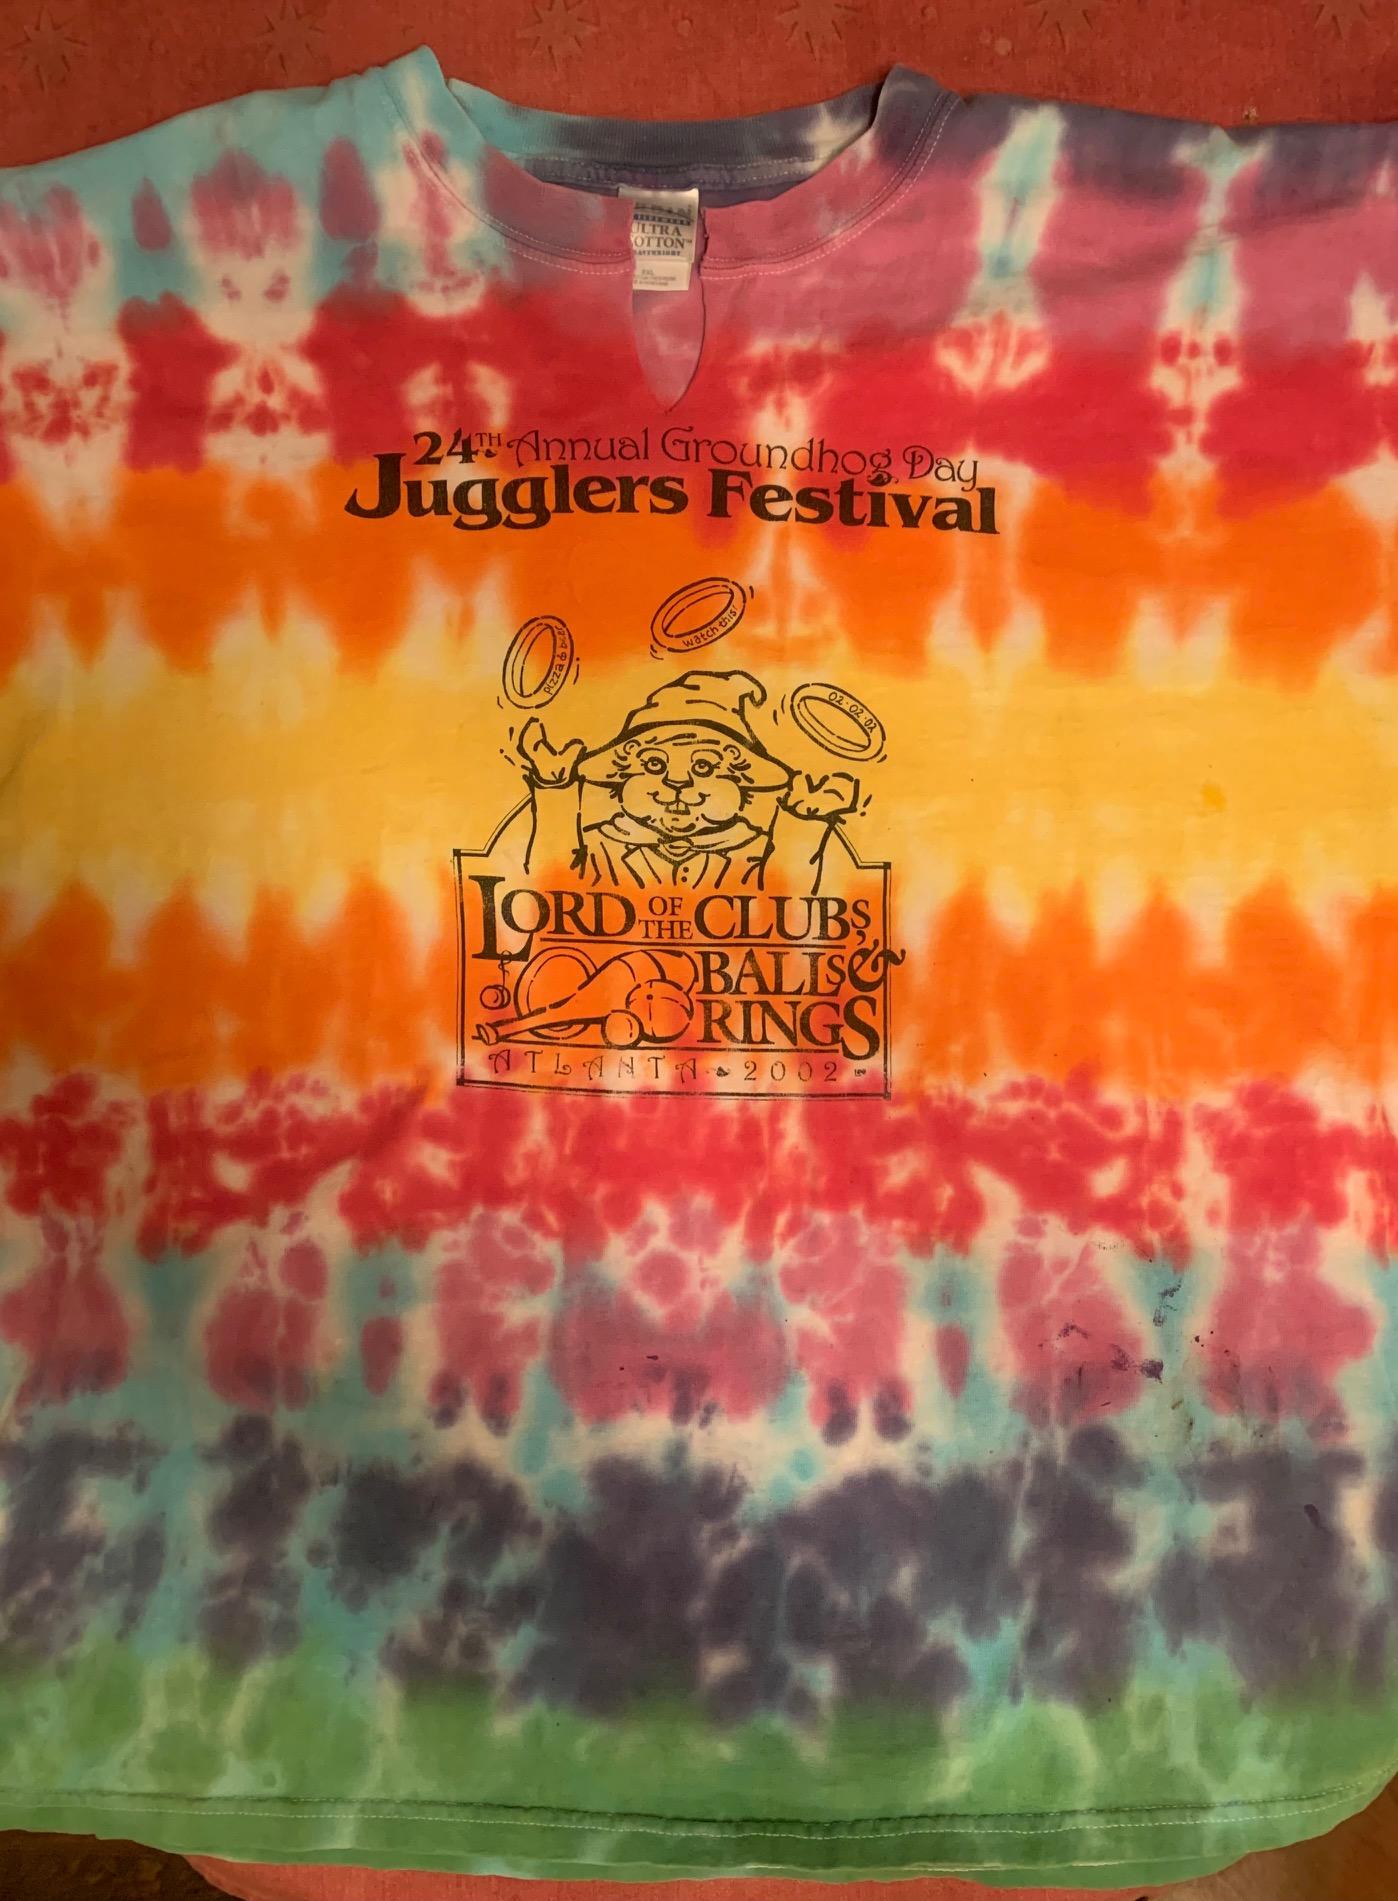 JugglerFest_69